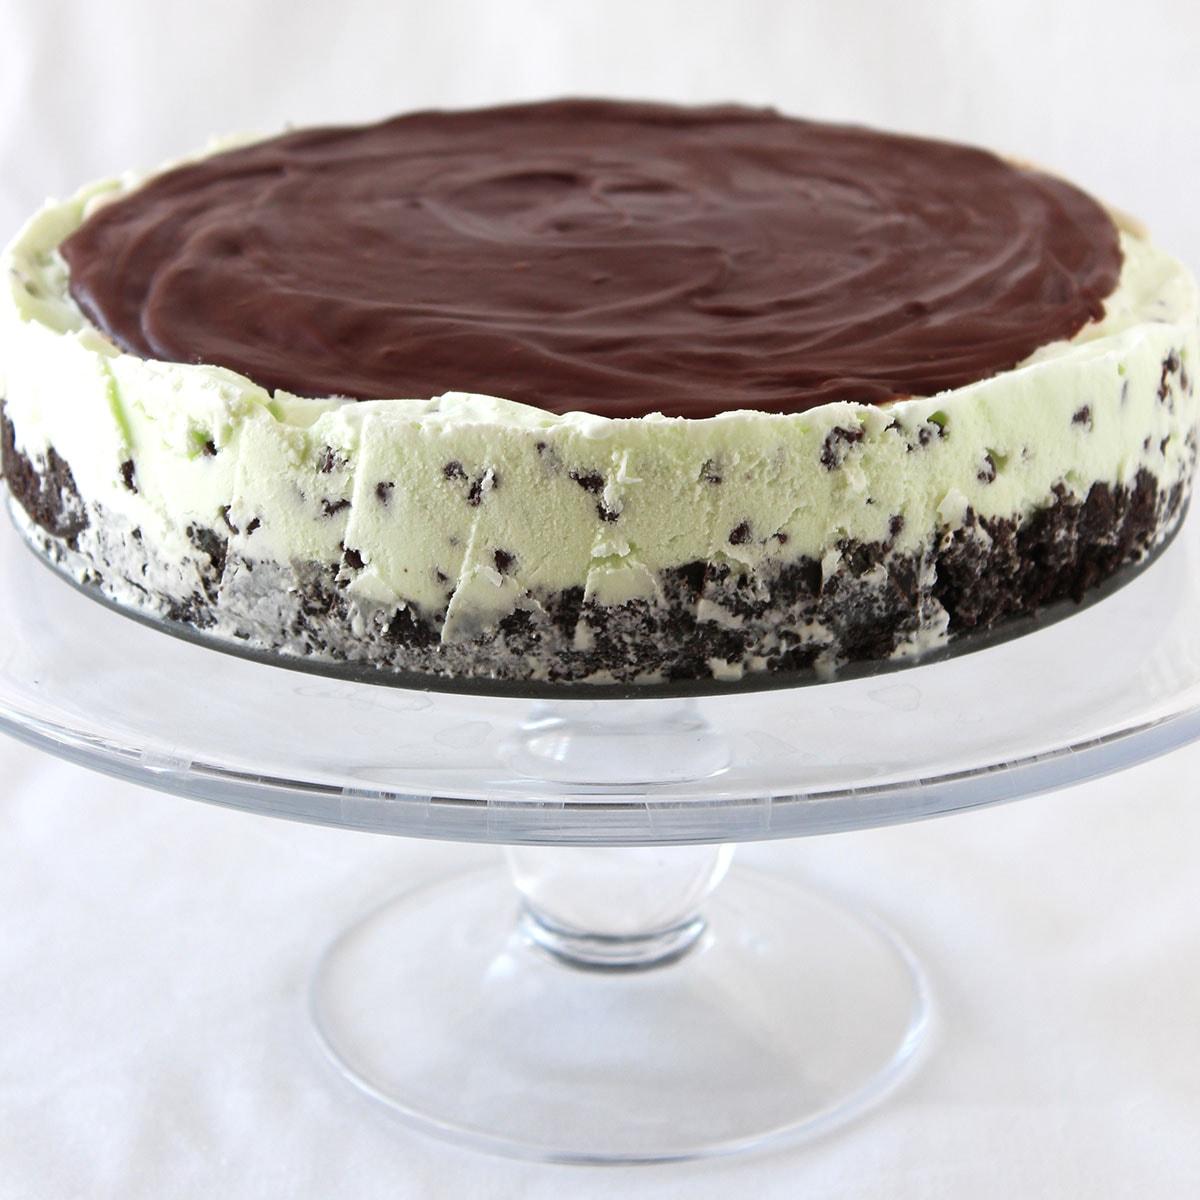 ... Ice Cream Chocolate Covered Strawberry Ice Cream Pie Frozen Mint